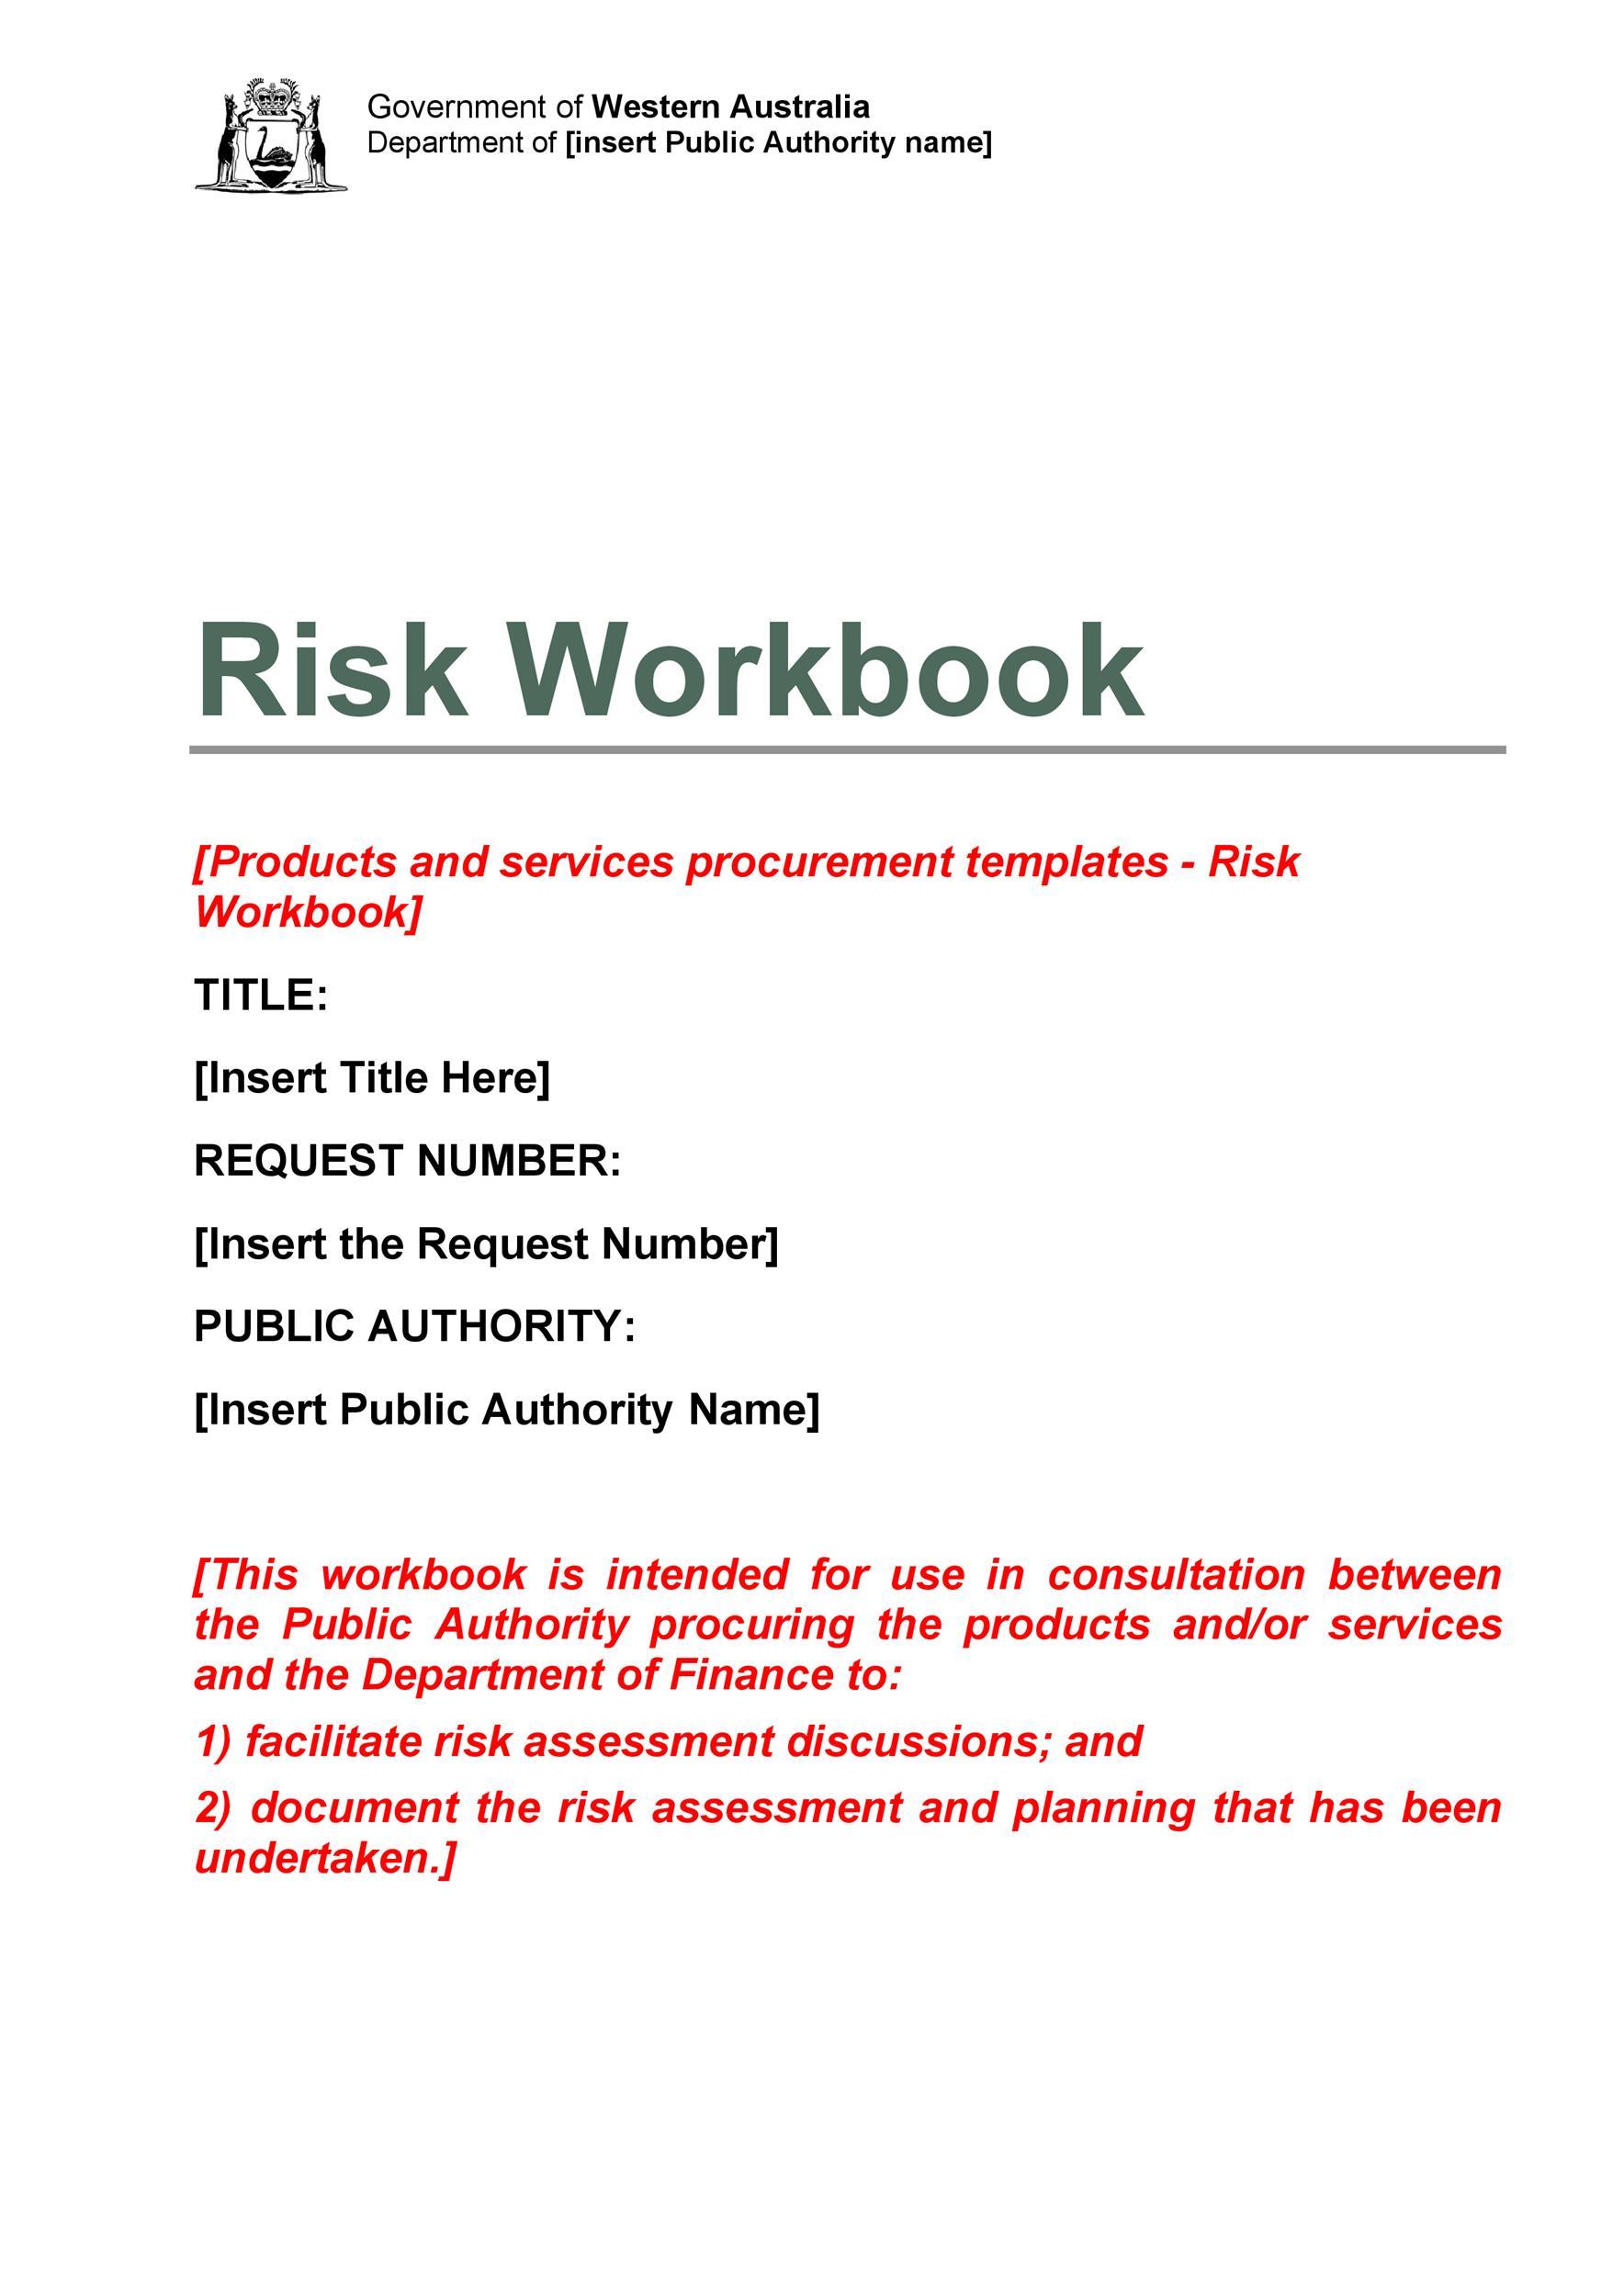 39 Free Risk Analysis Templates (+ Risk Assessment Matrix) ᐅ